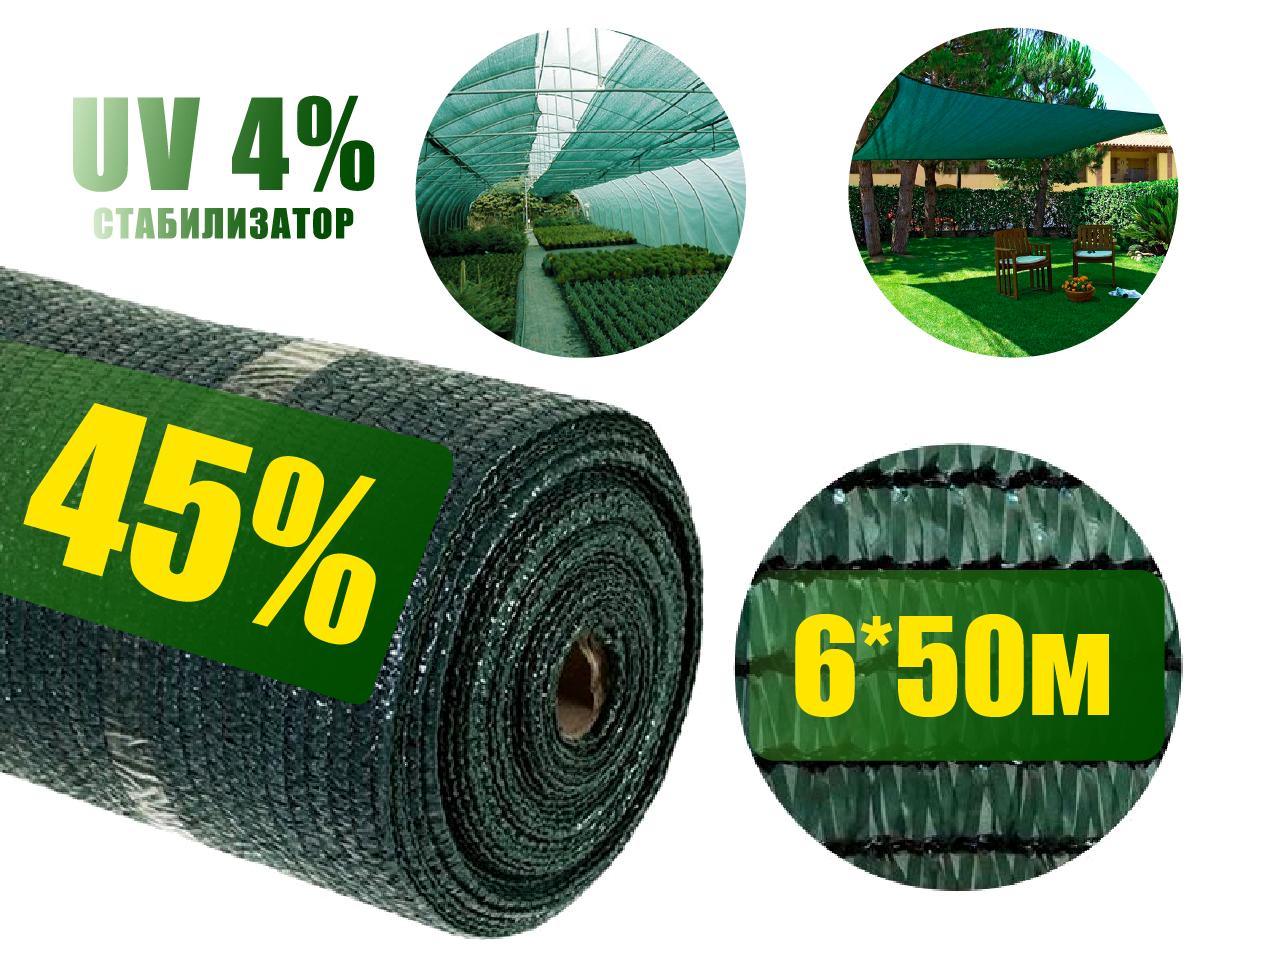 Сетка затеняющая 45%  6м*50м зеленая